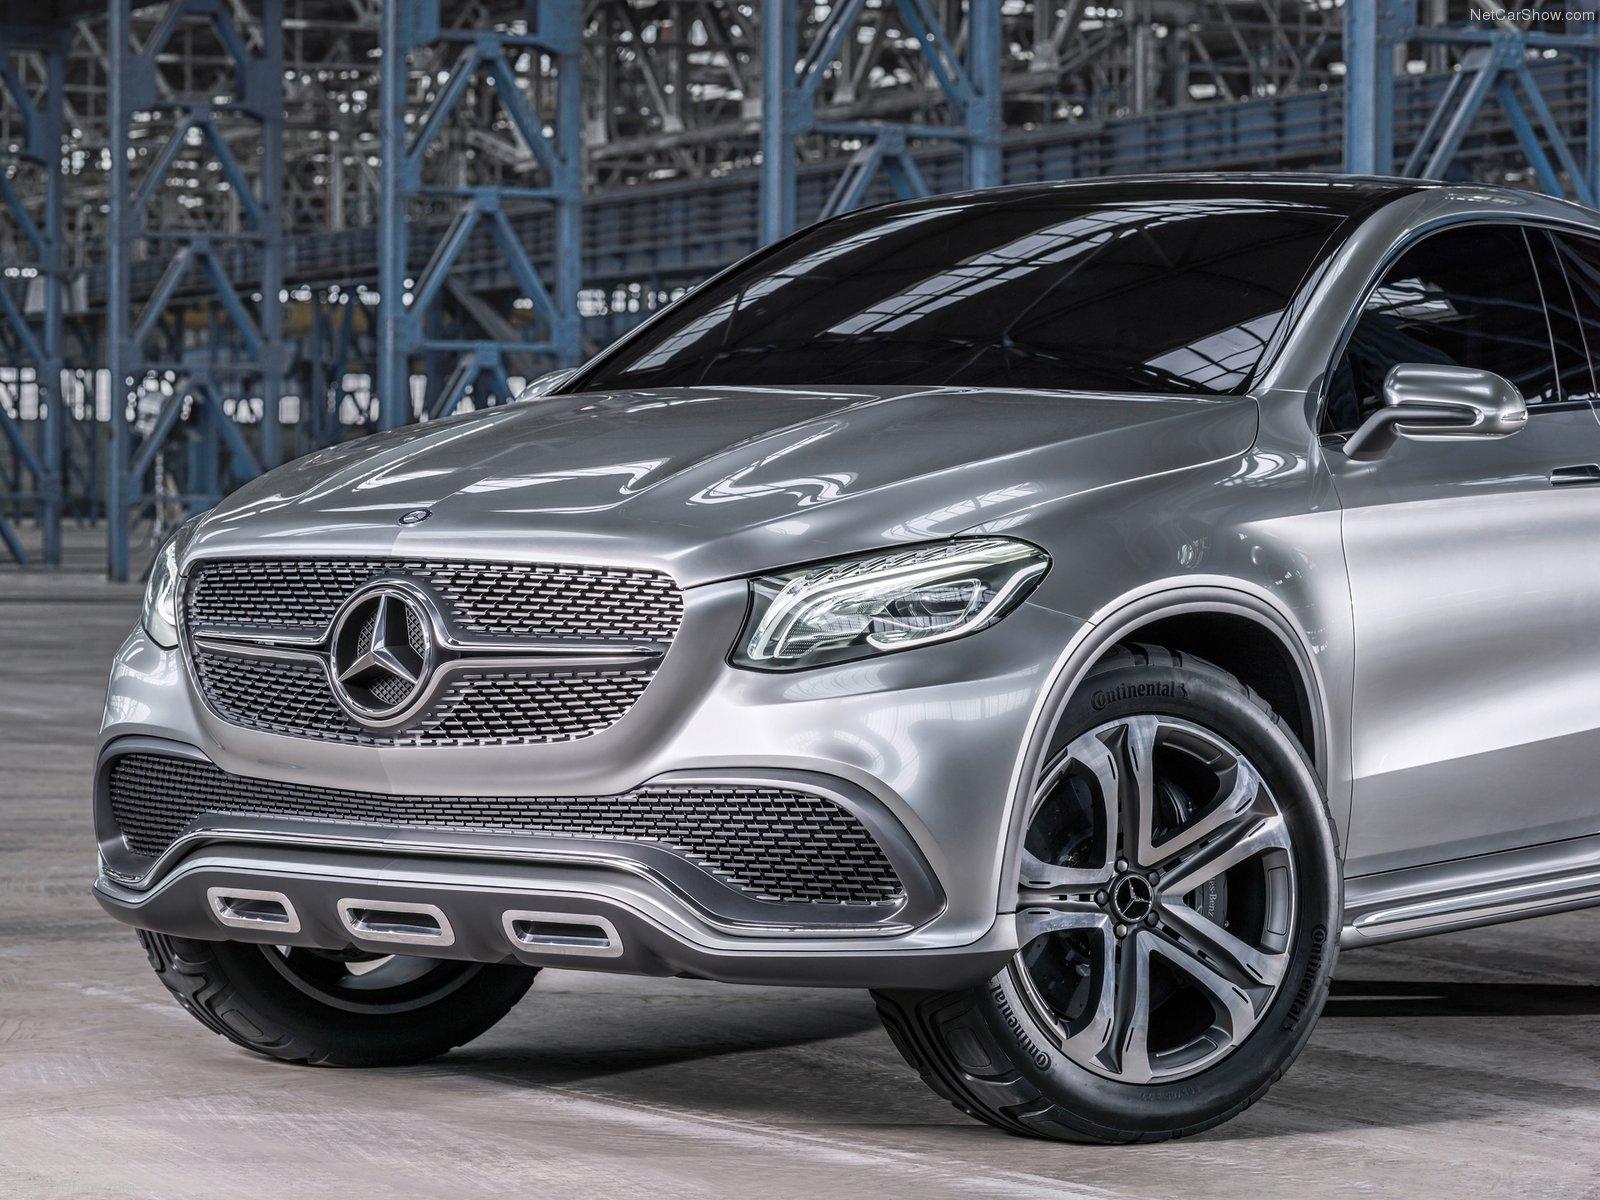 2014 mercedes benz concept coupe suv mercedes benz for Mercedes benz 2014 suv models